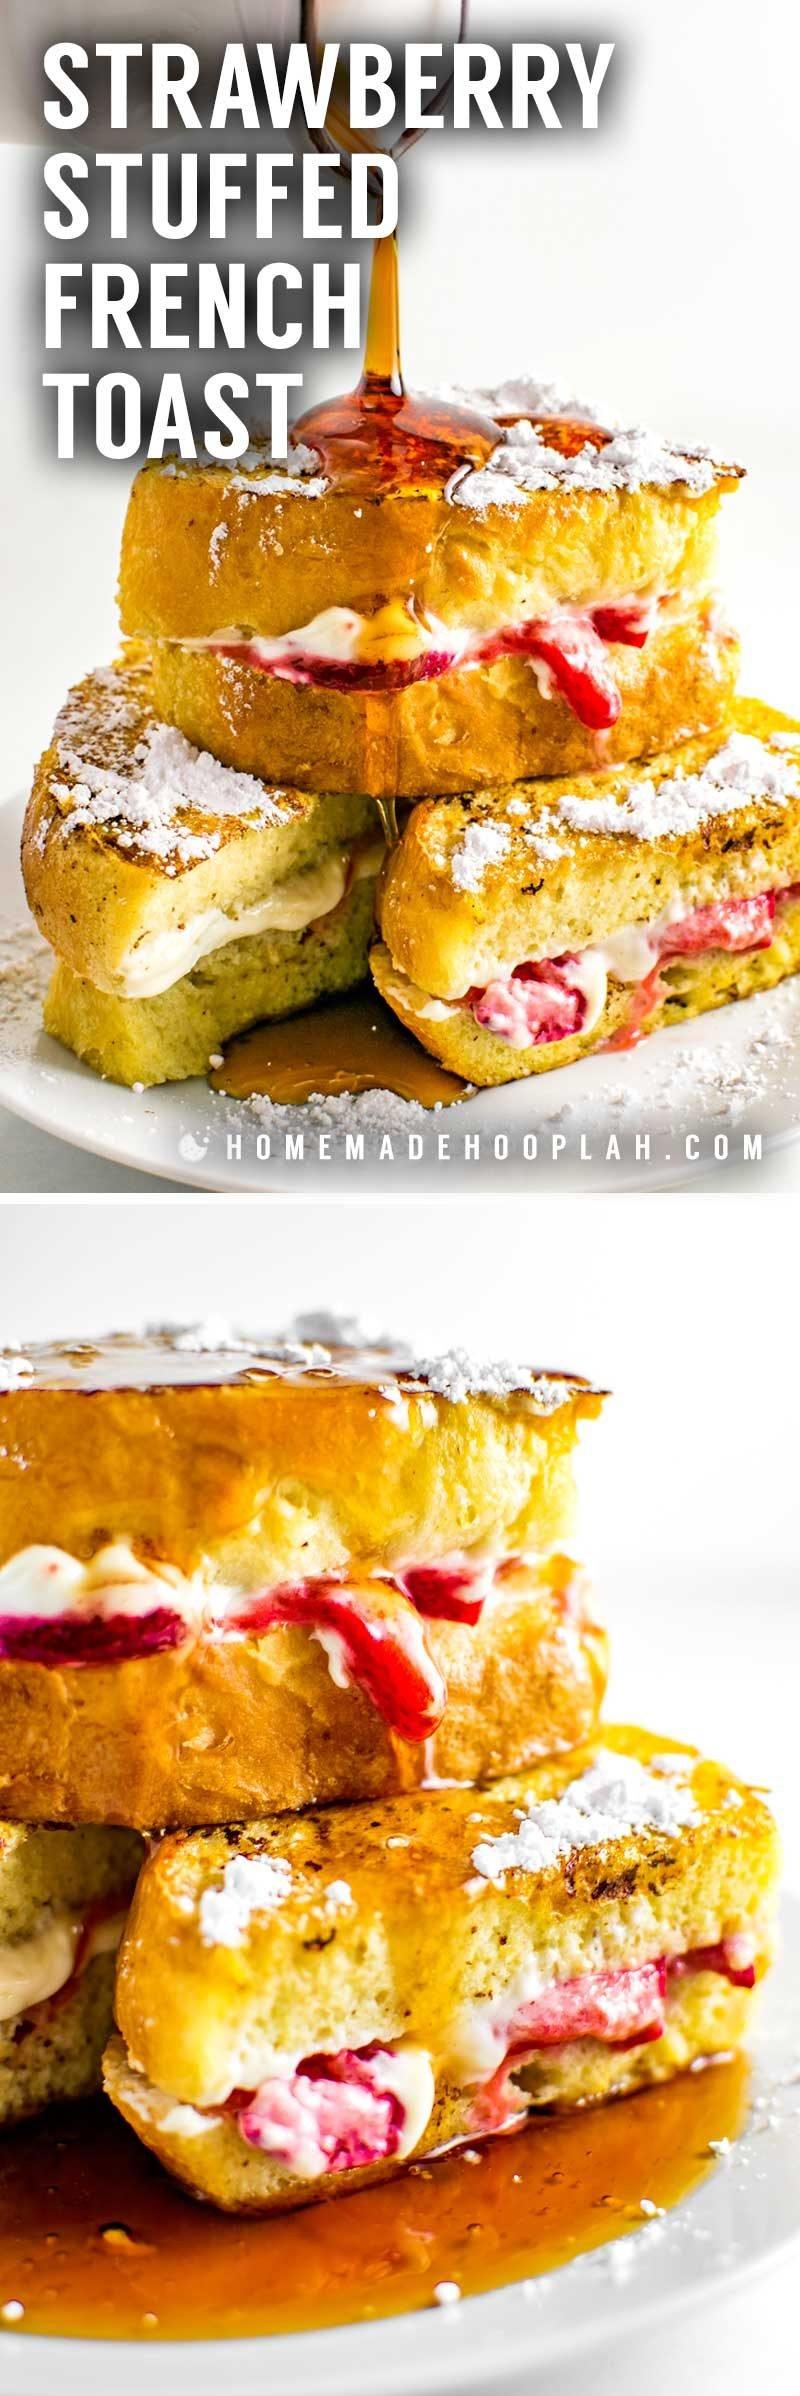 Easy strawberry cream cheese stuffed french toast recipe.